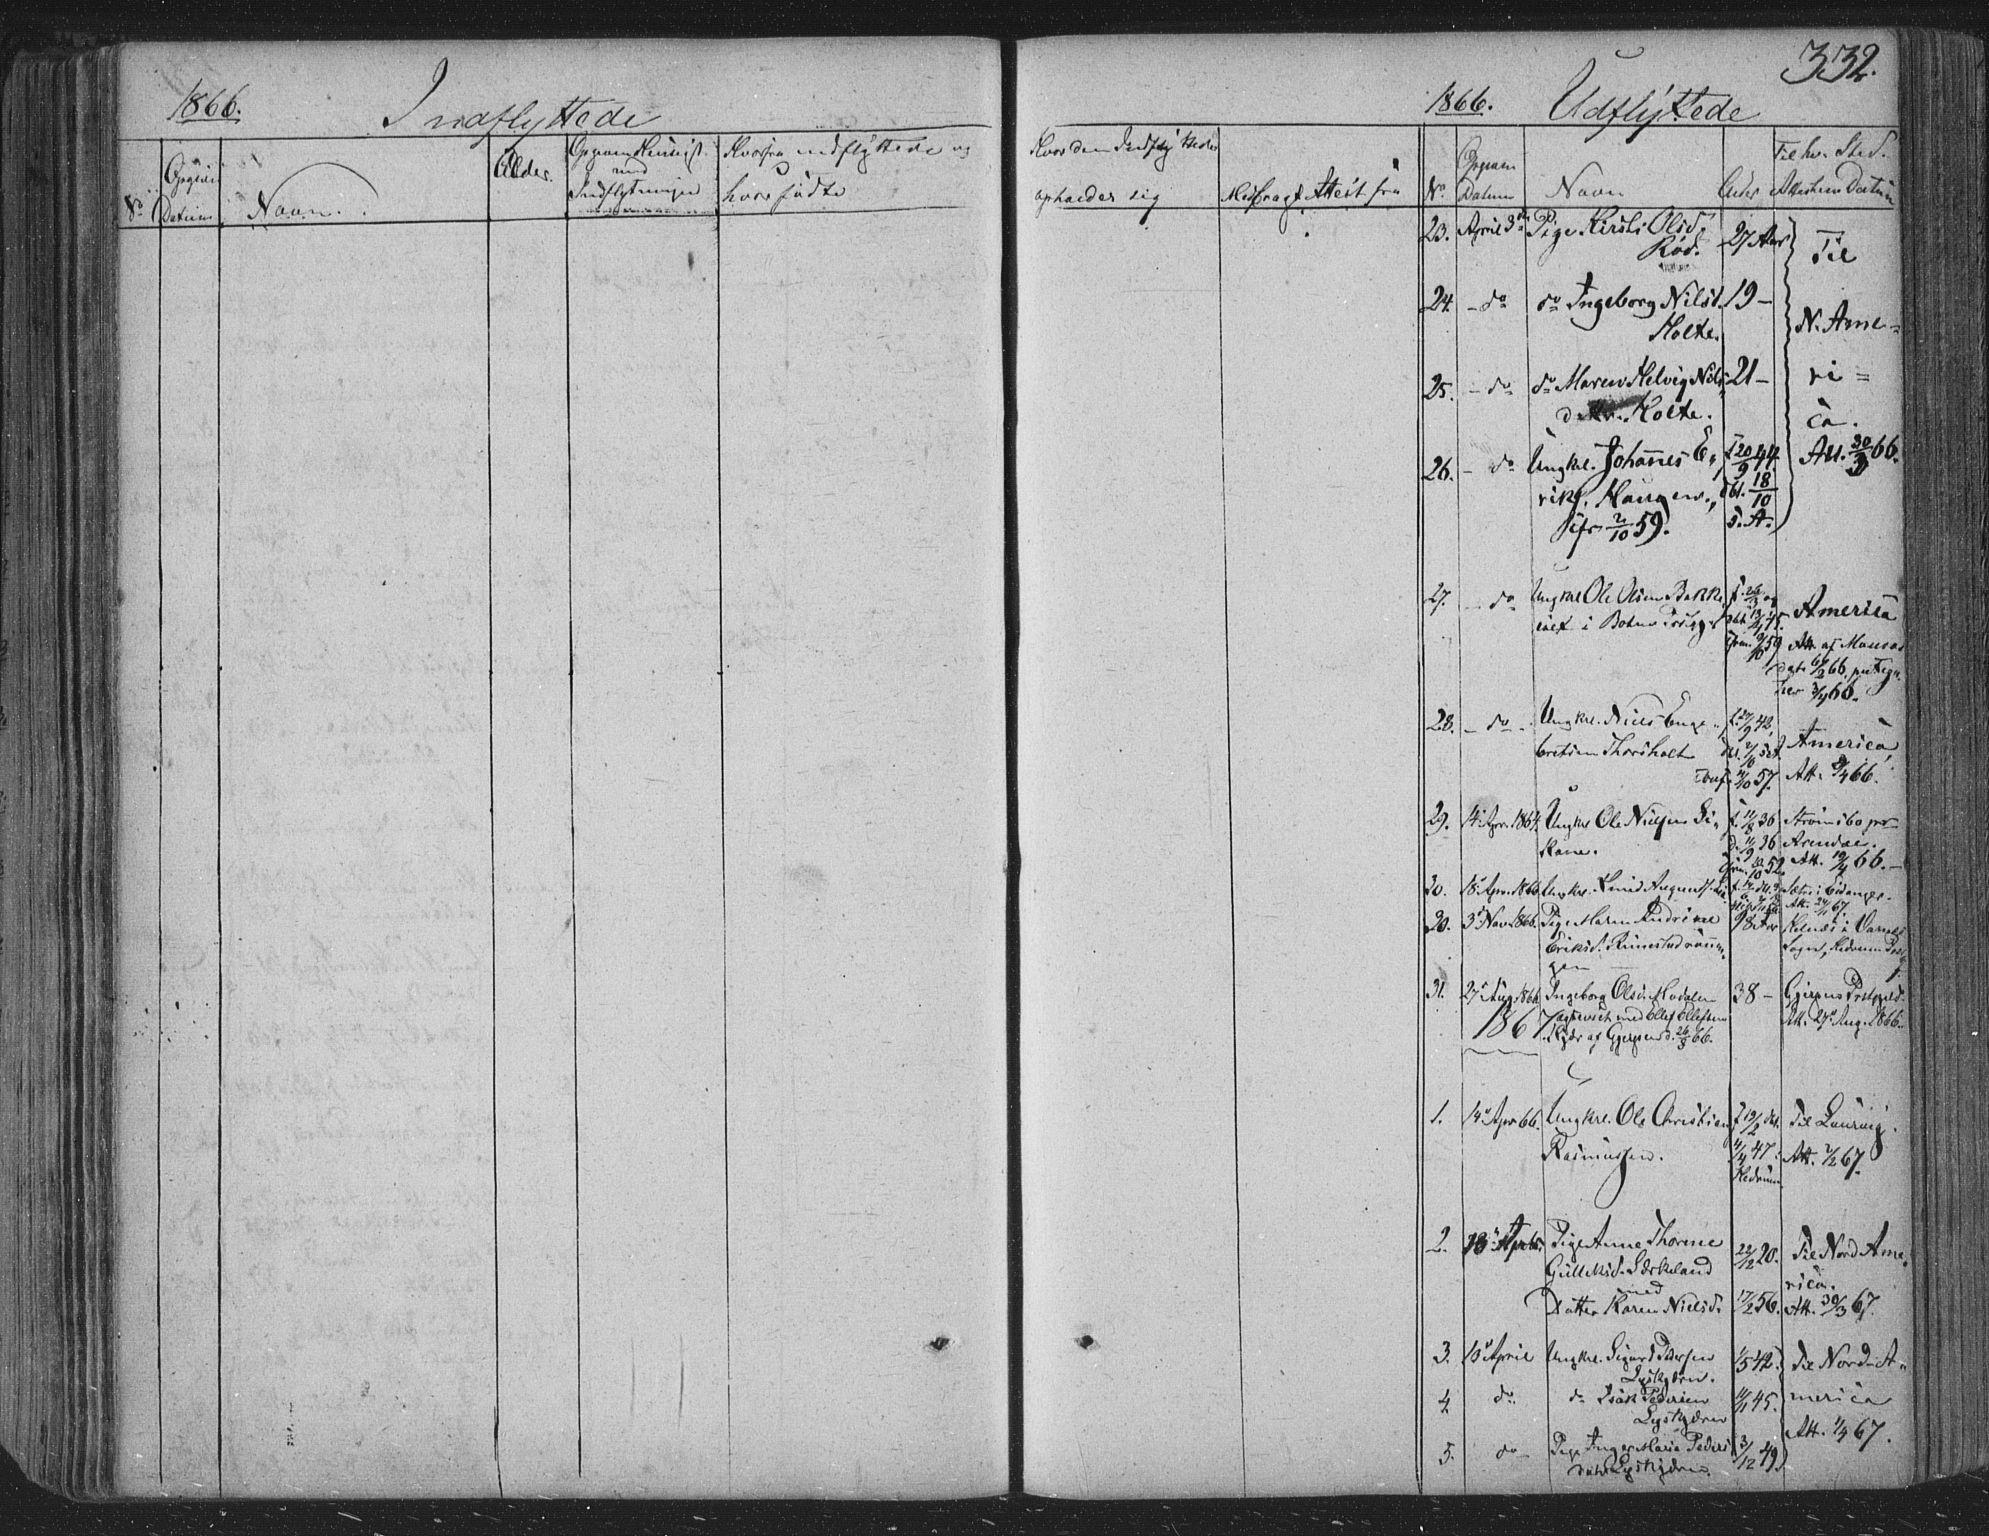 SAKO, Siljan kirkebøker, F/Fa/L0001: Parish register (official) no. 1, 1831-1870, p. 332